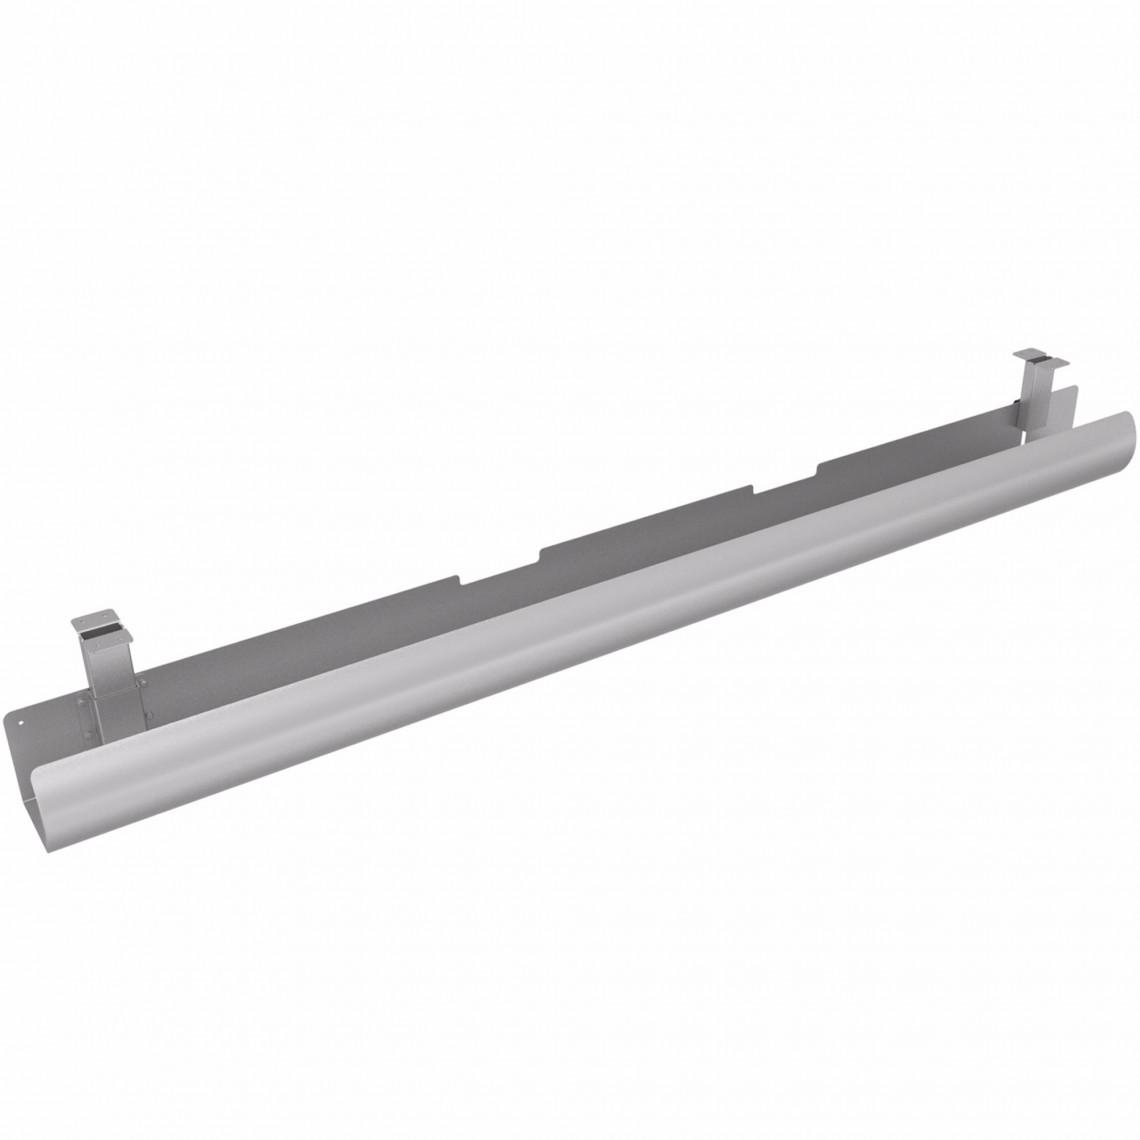 LiftPipe Kabelrör - 1450 mm, Silver